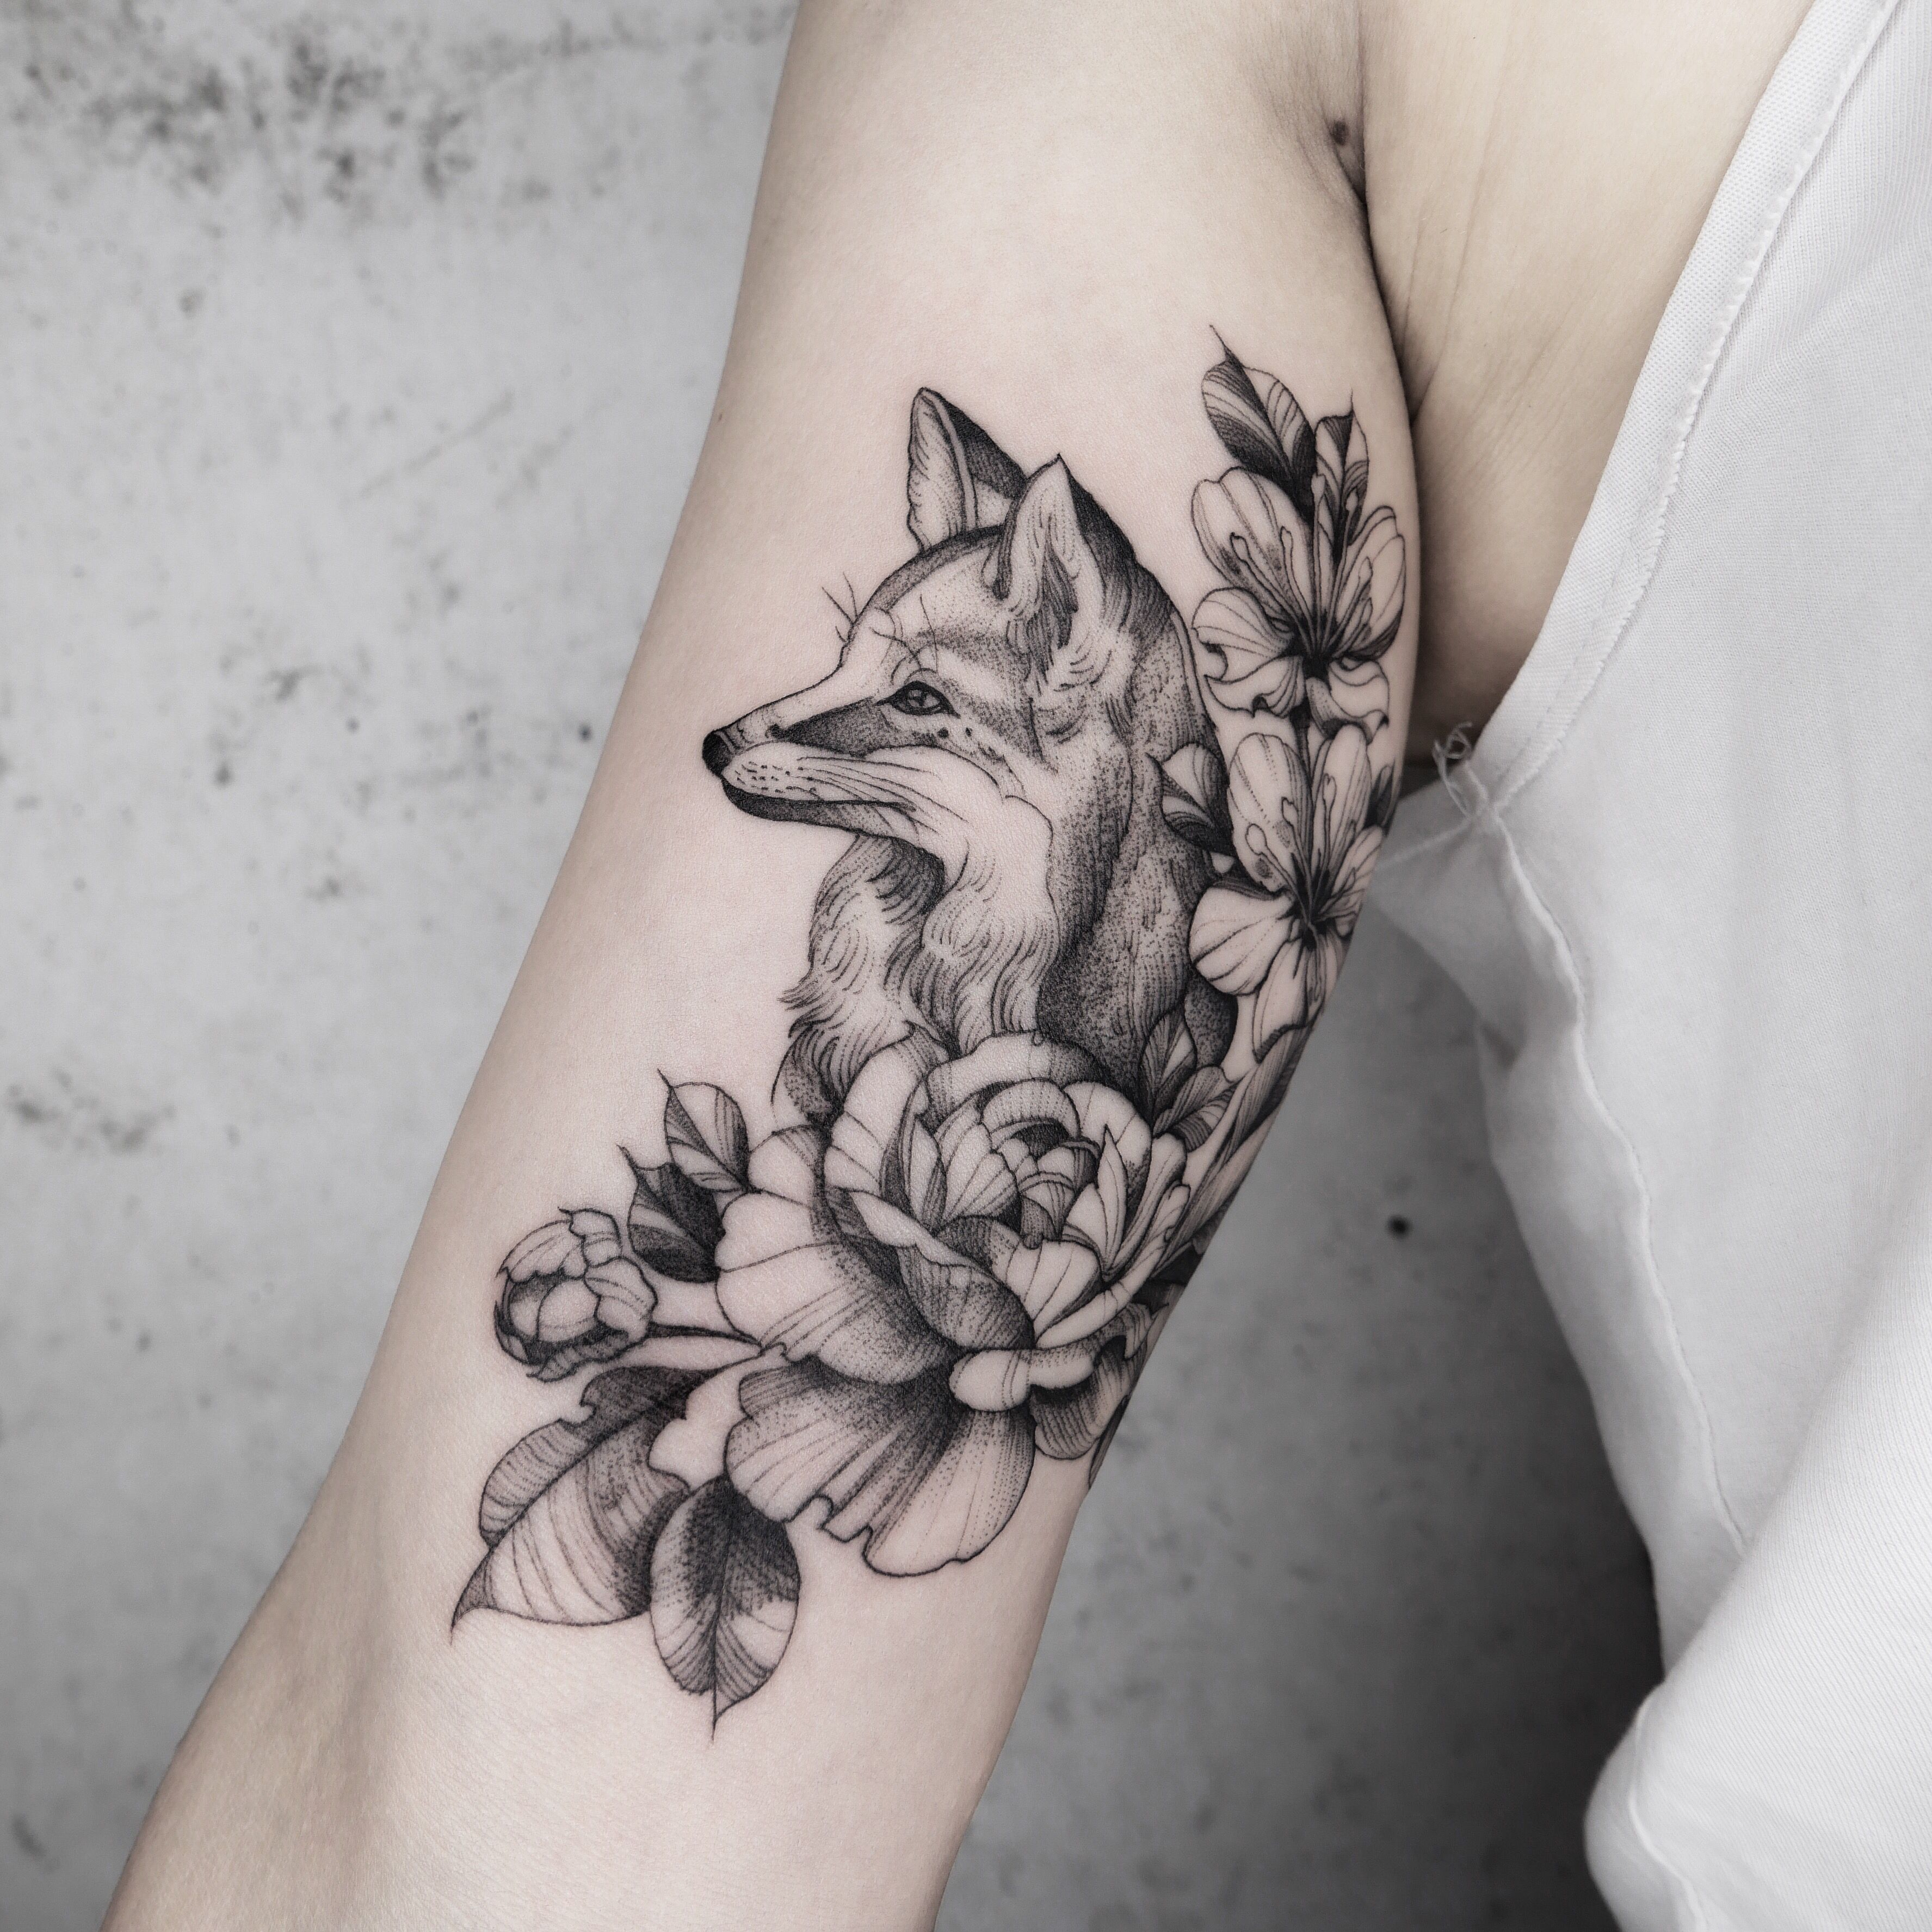 Lydia Sharon Hughes Animal Tattoos For Women Arm Band Tattoo For Women Tattoos